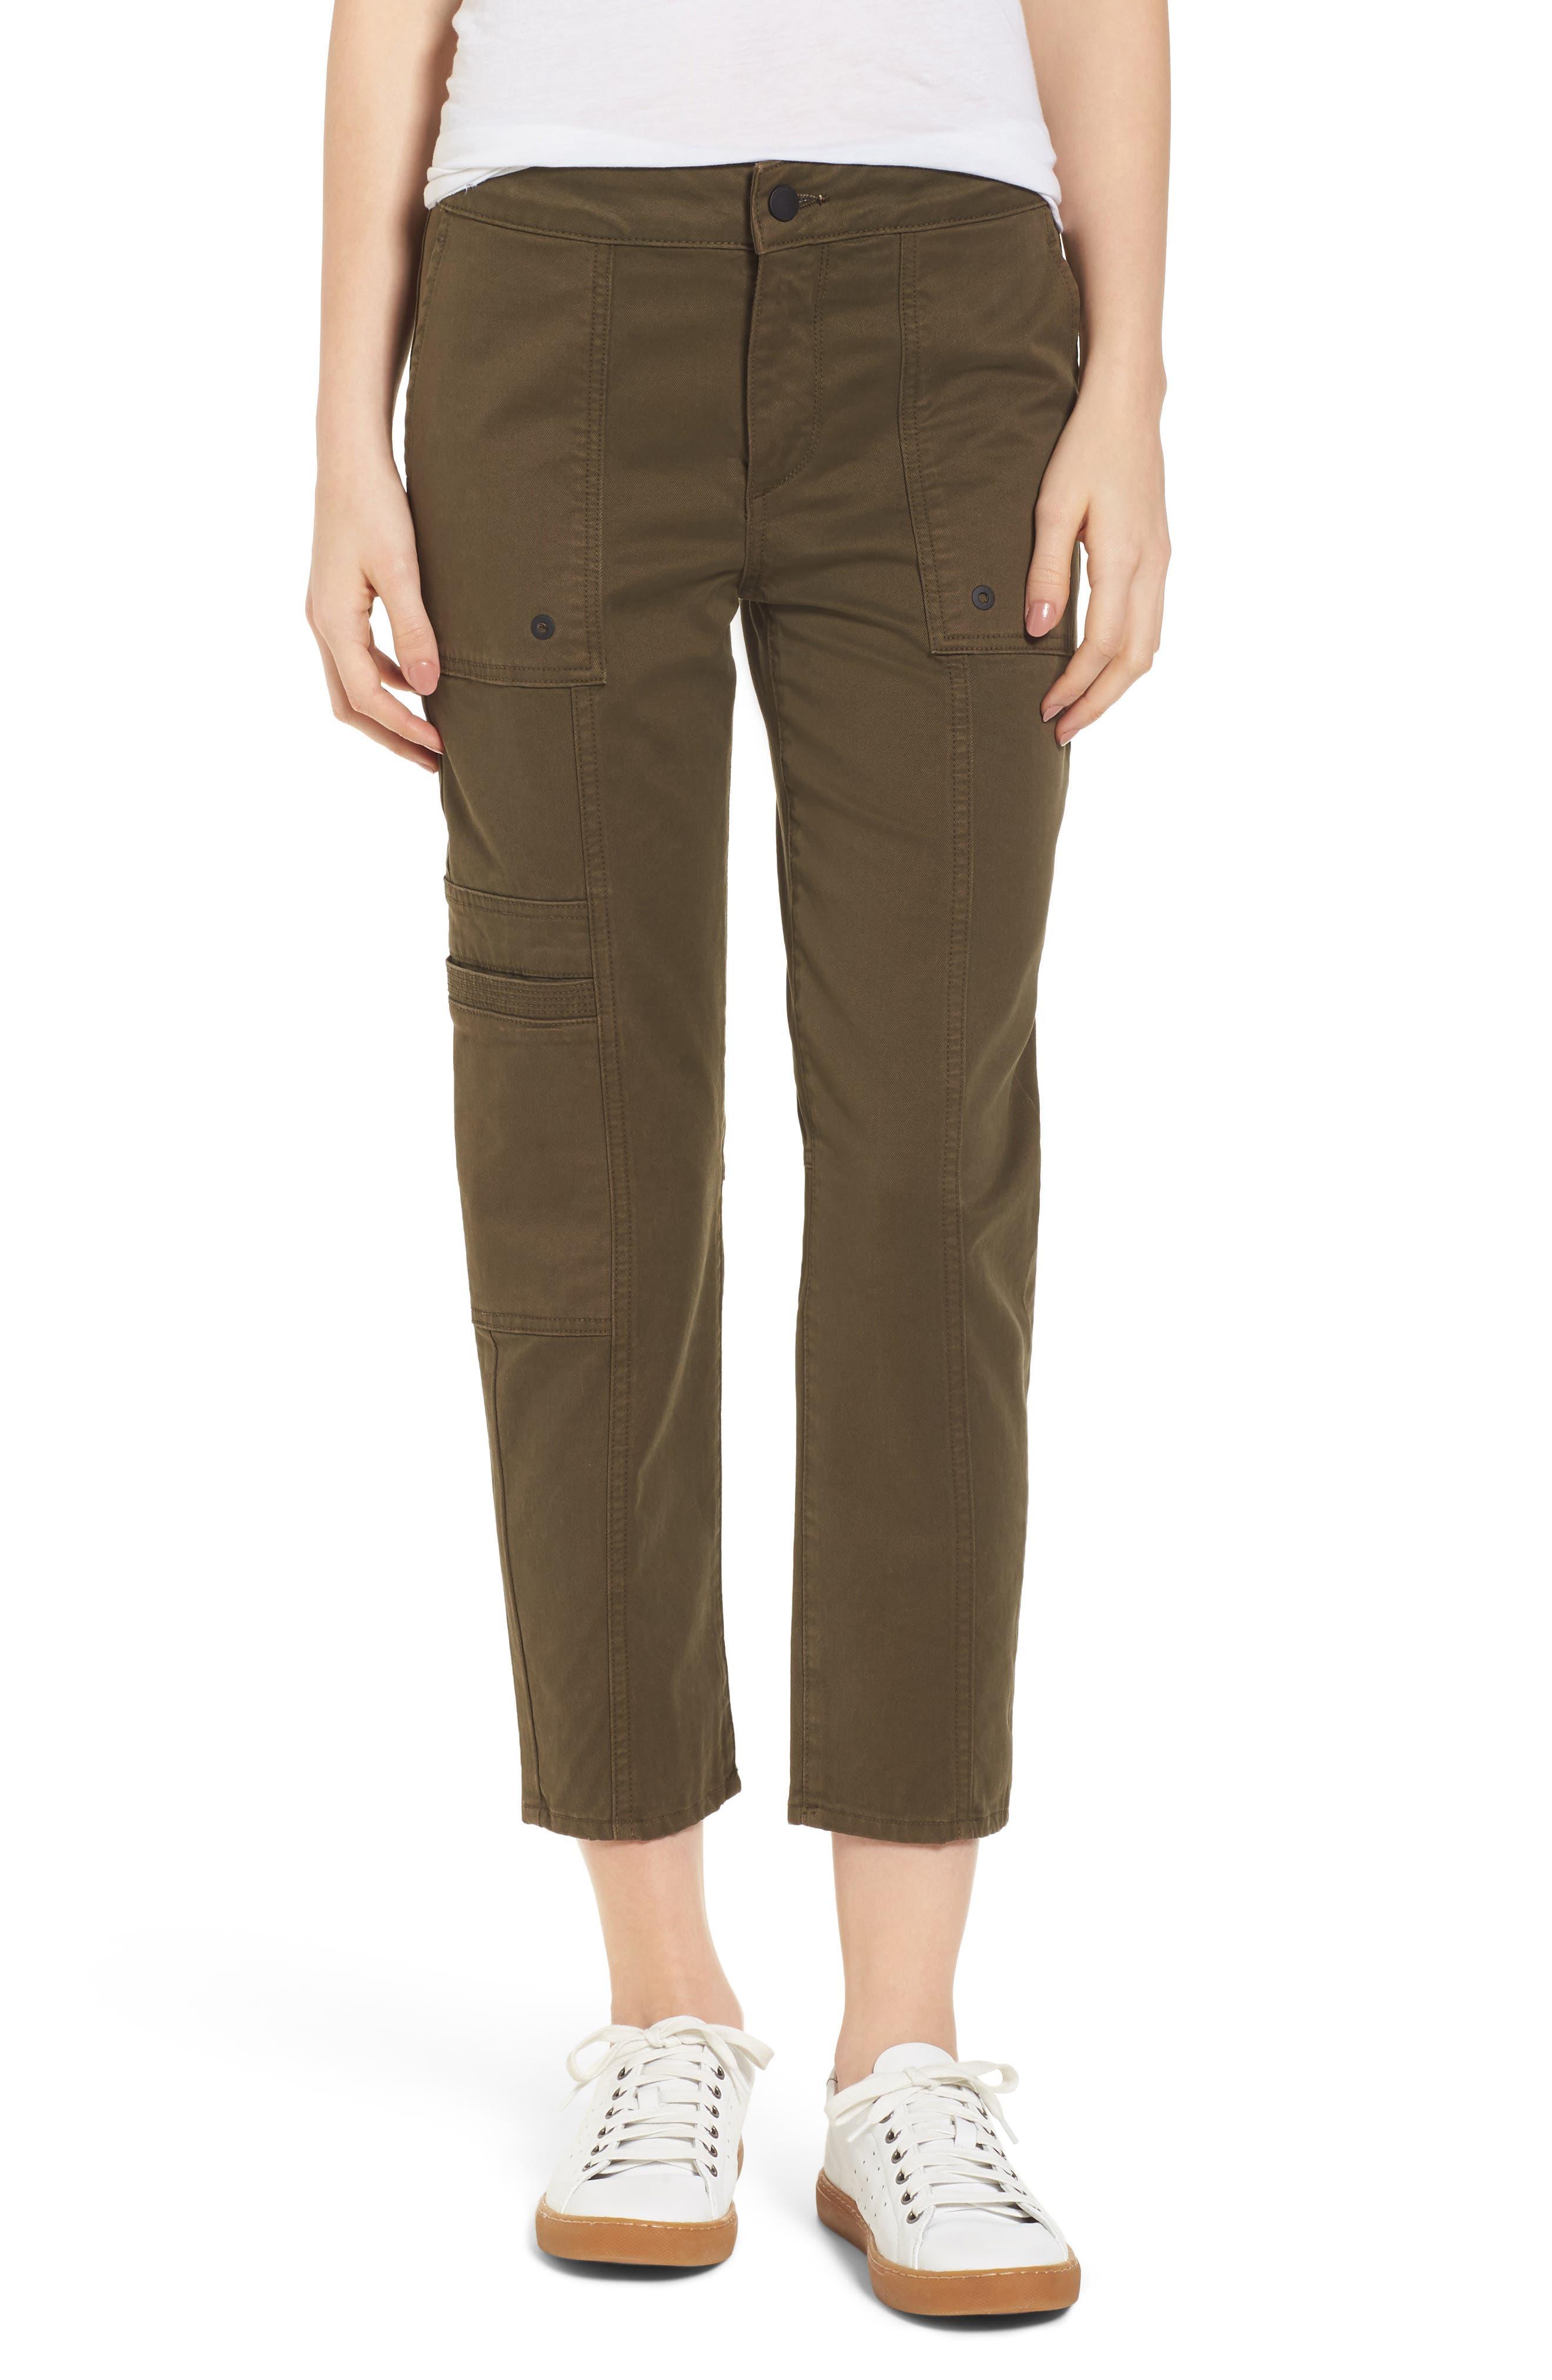 Elliot Slouchy Slim Cargo Pants,                         Main,                         color, 205